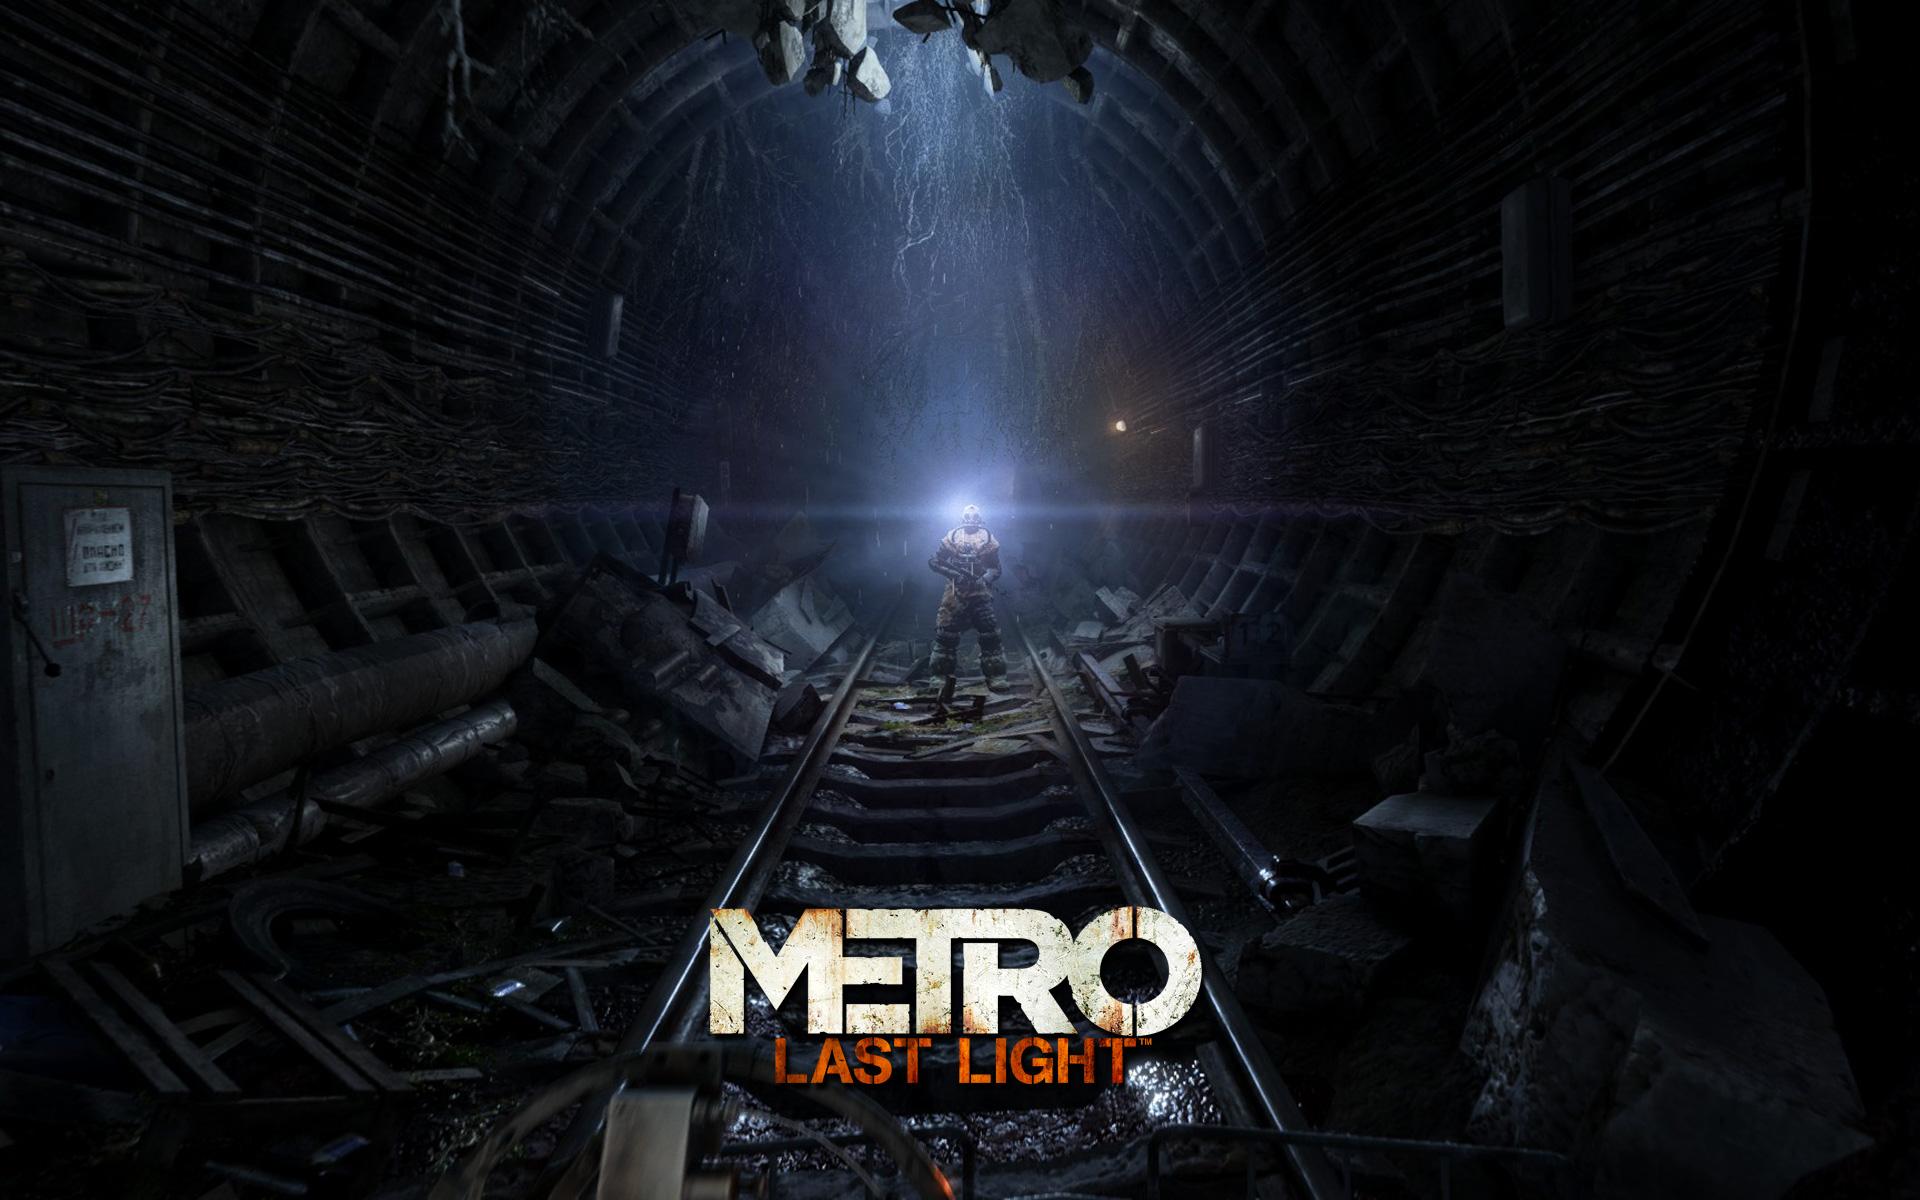 Free Metro: Last Light Wallpaper in 1920x1200